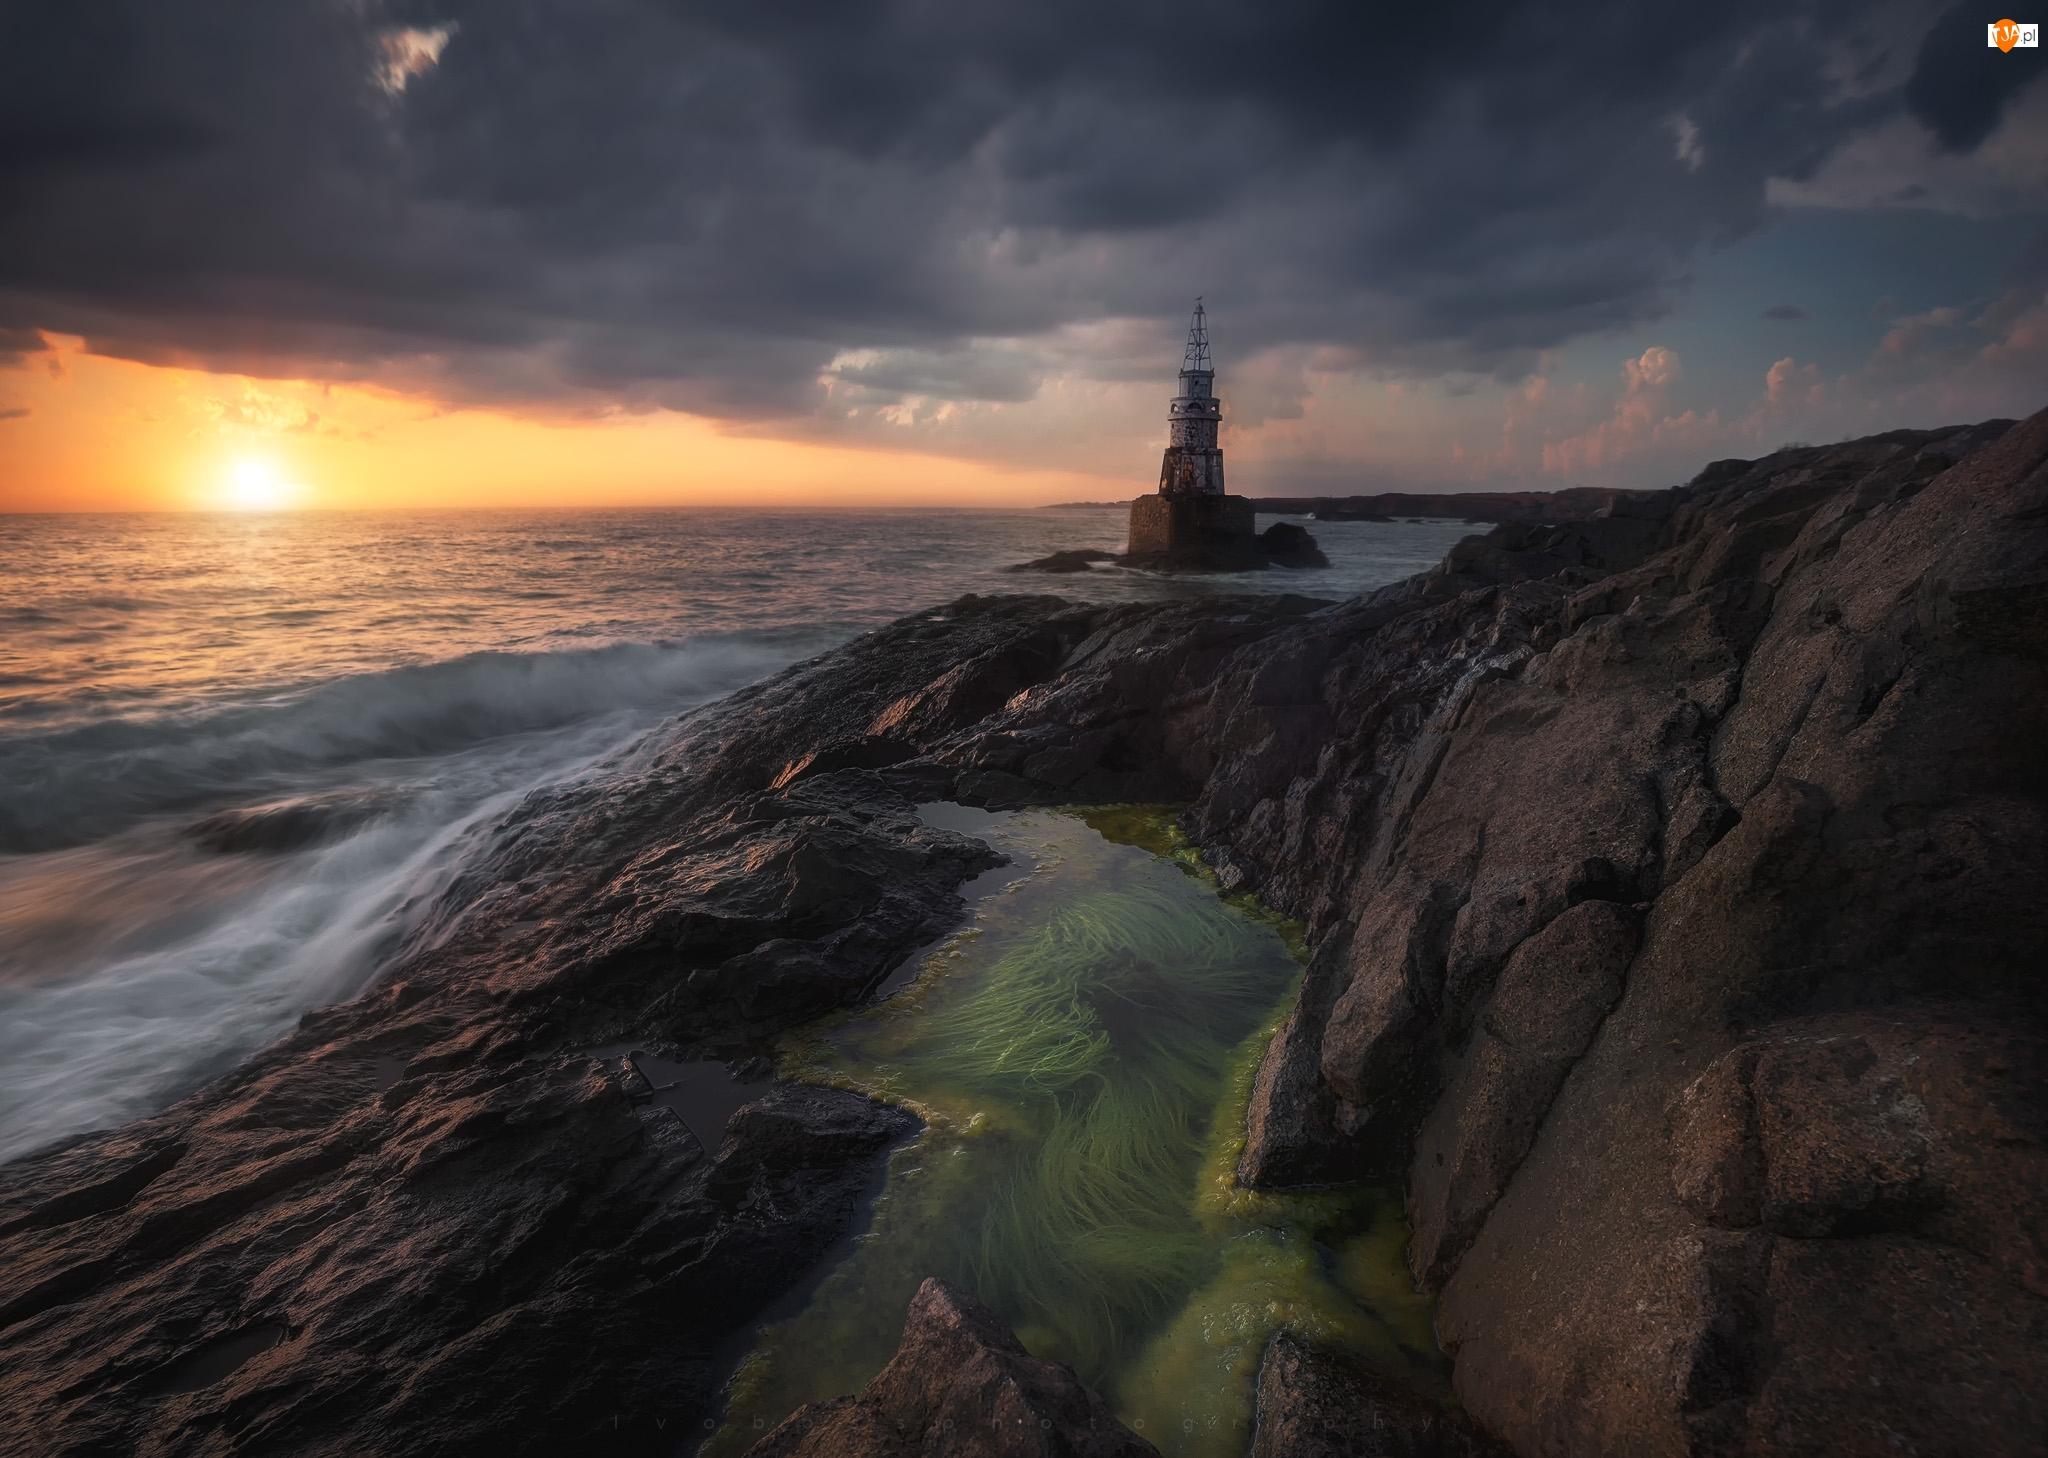 Zachód słońca, Morze Czarne, Skały, Bułgaria, Latarnia morska, Ahtopol